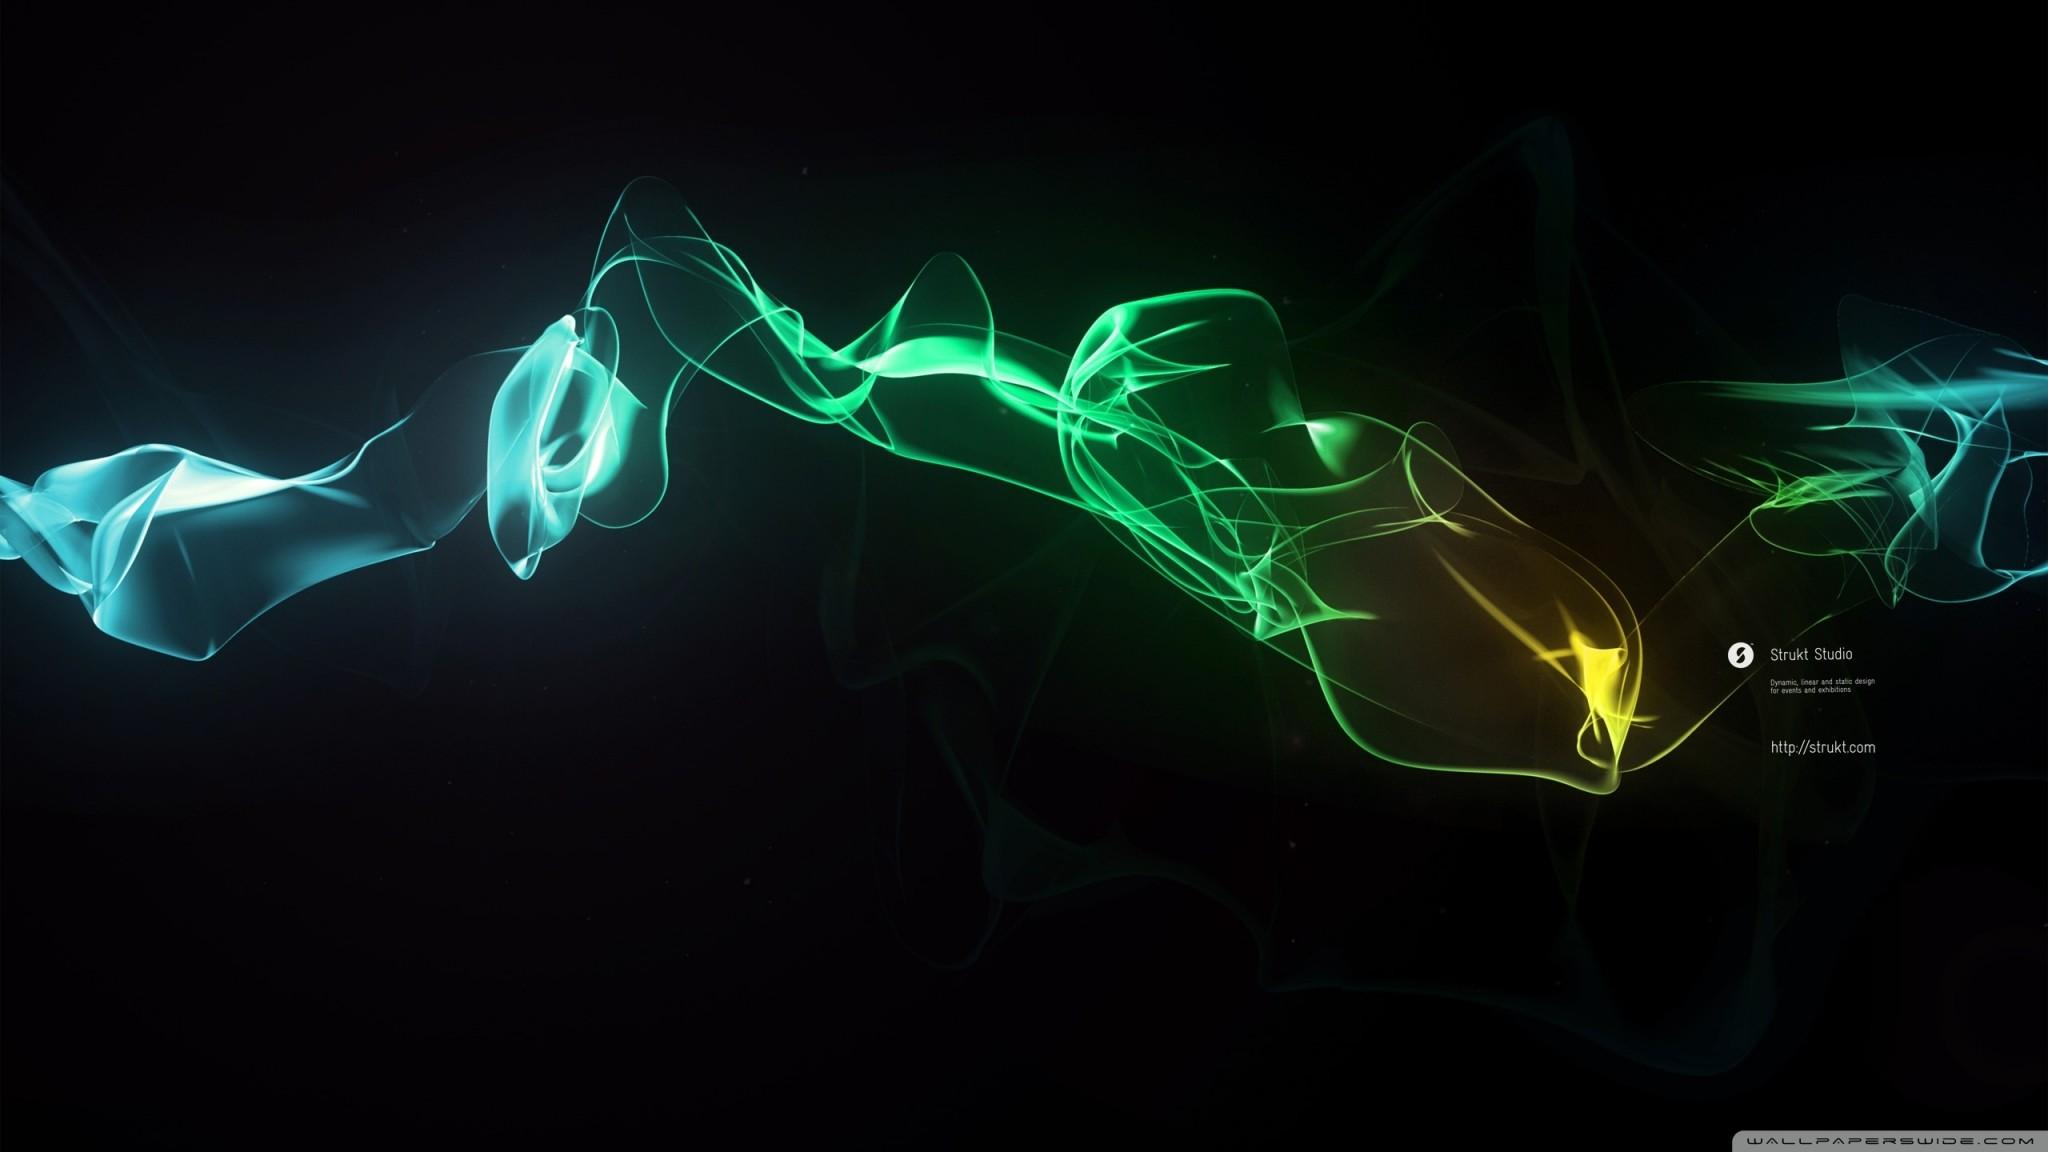 Smoke Wallpaper #159 2560×1440 pixel Exotic Wallpaper @ Cuzzsoft .